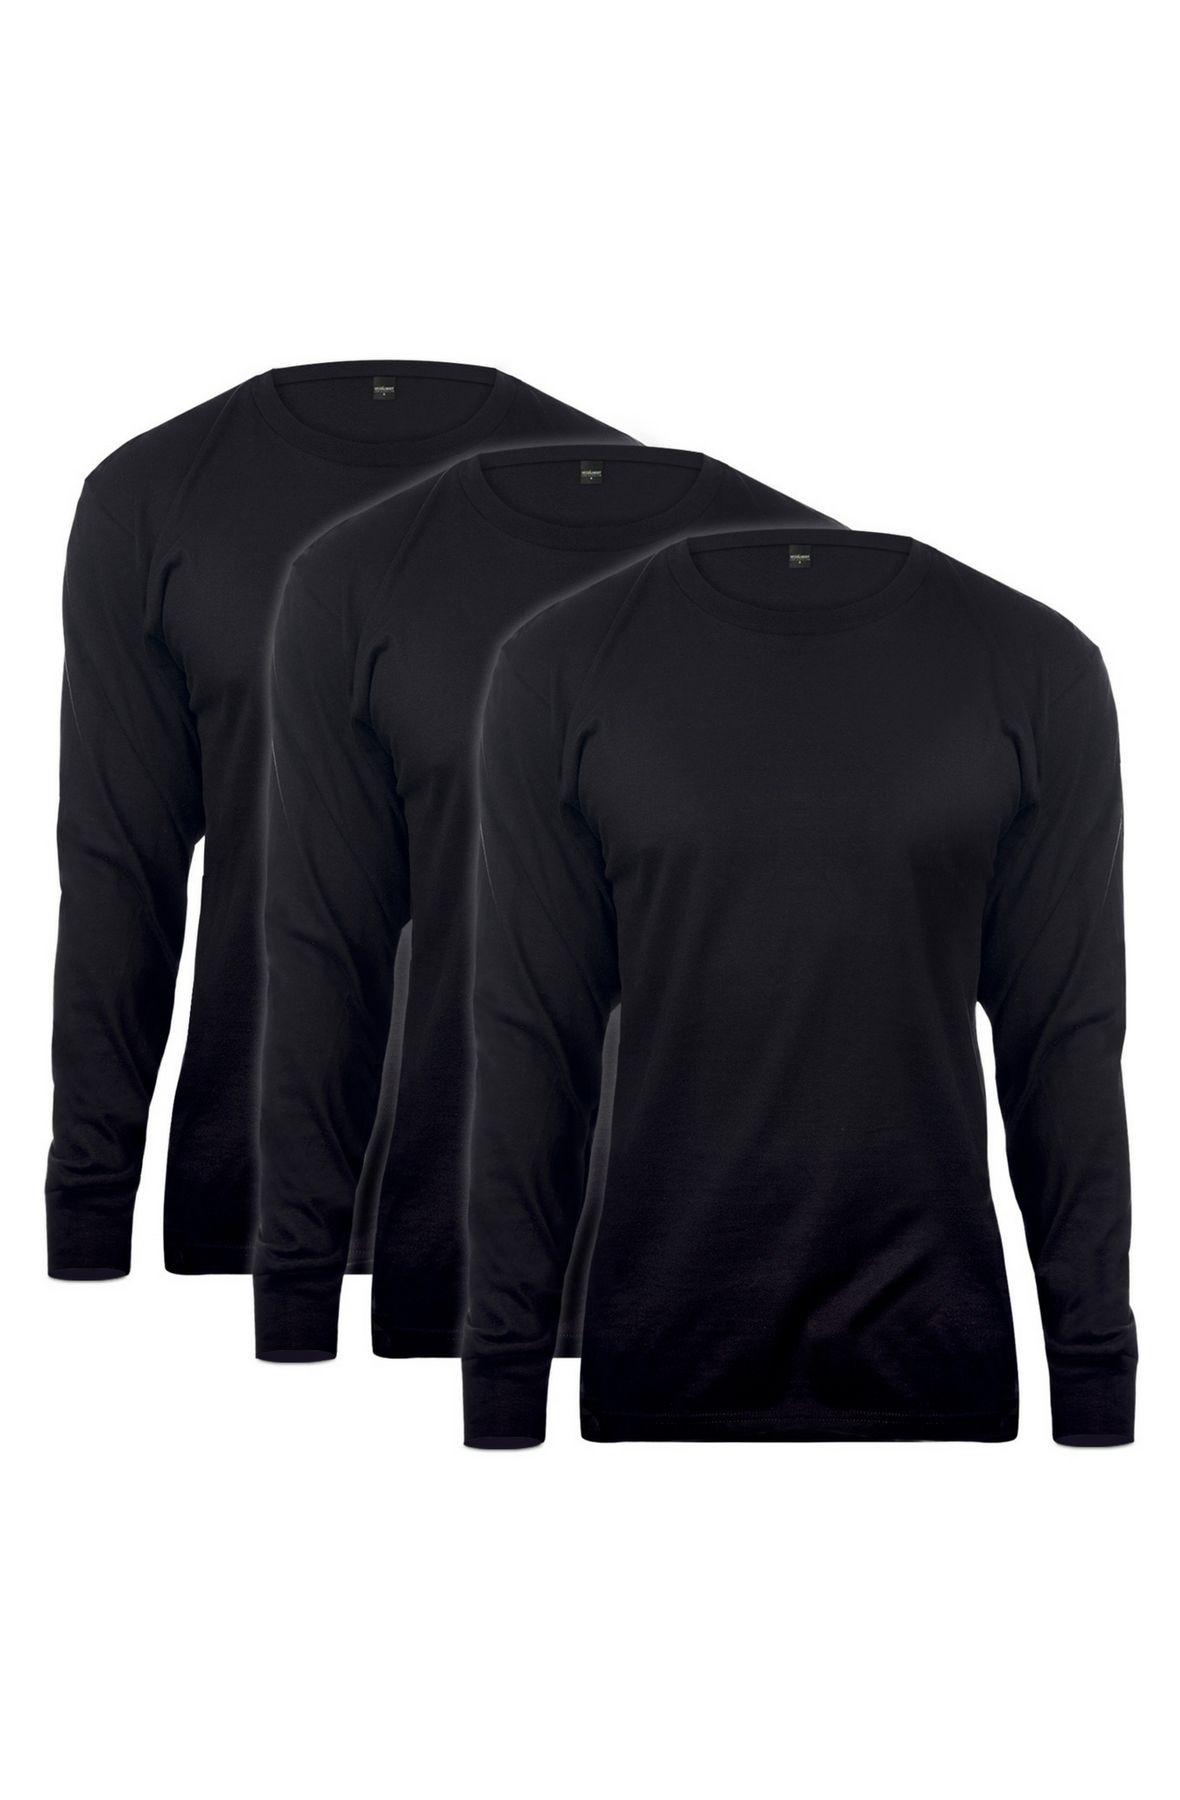 Basic Long Sleeve Tee 3 Pack (Black)